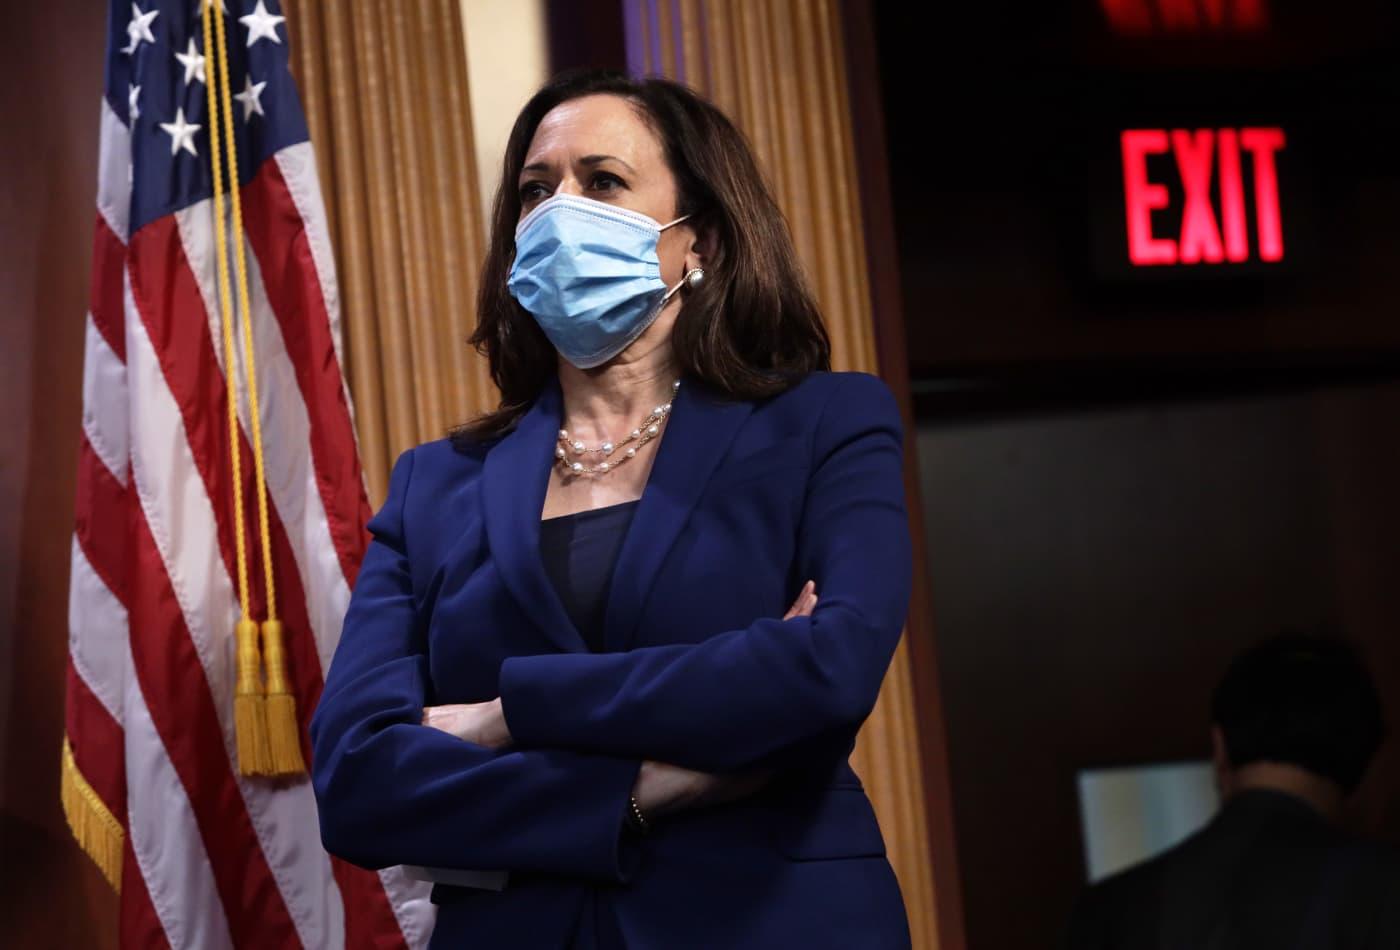 Where Kamala Harris stands on coronavirus masks, stimulus checks and other pandemic spending